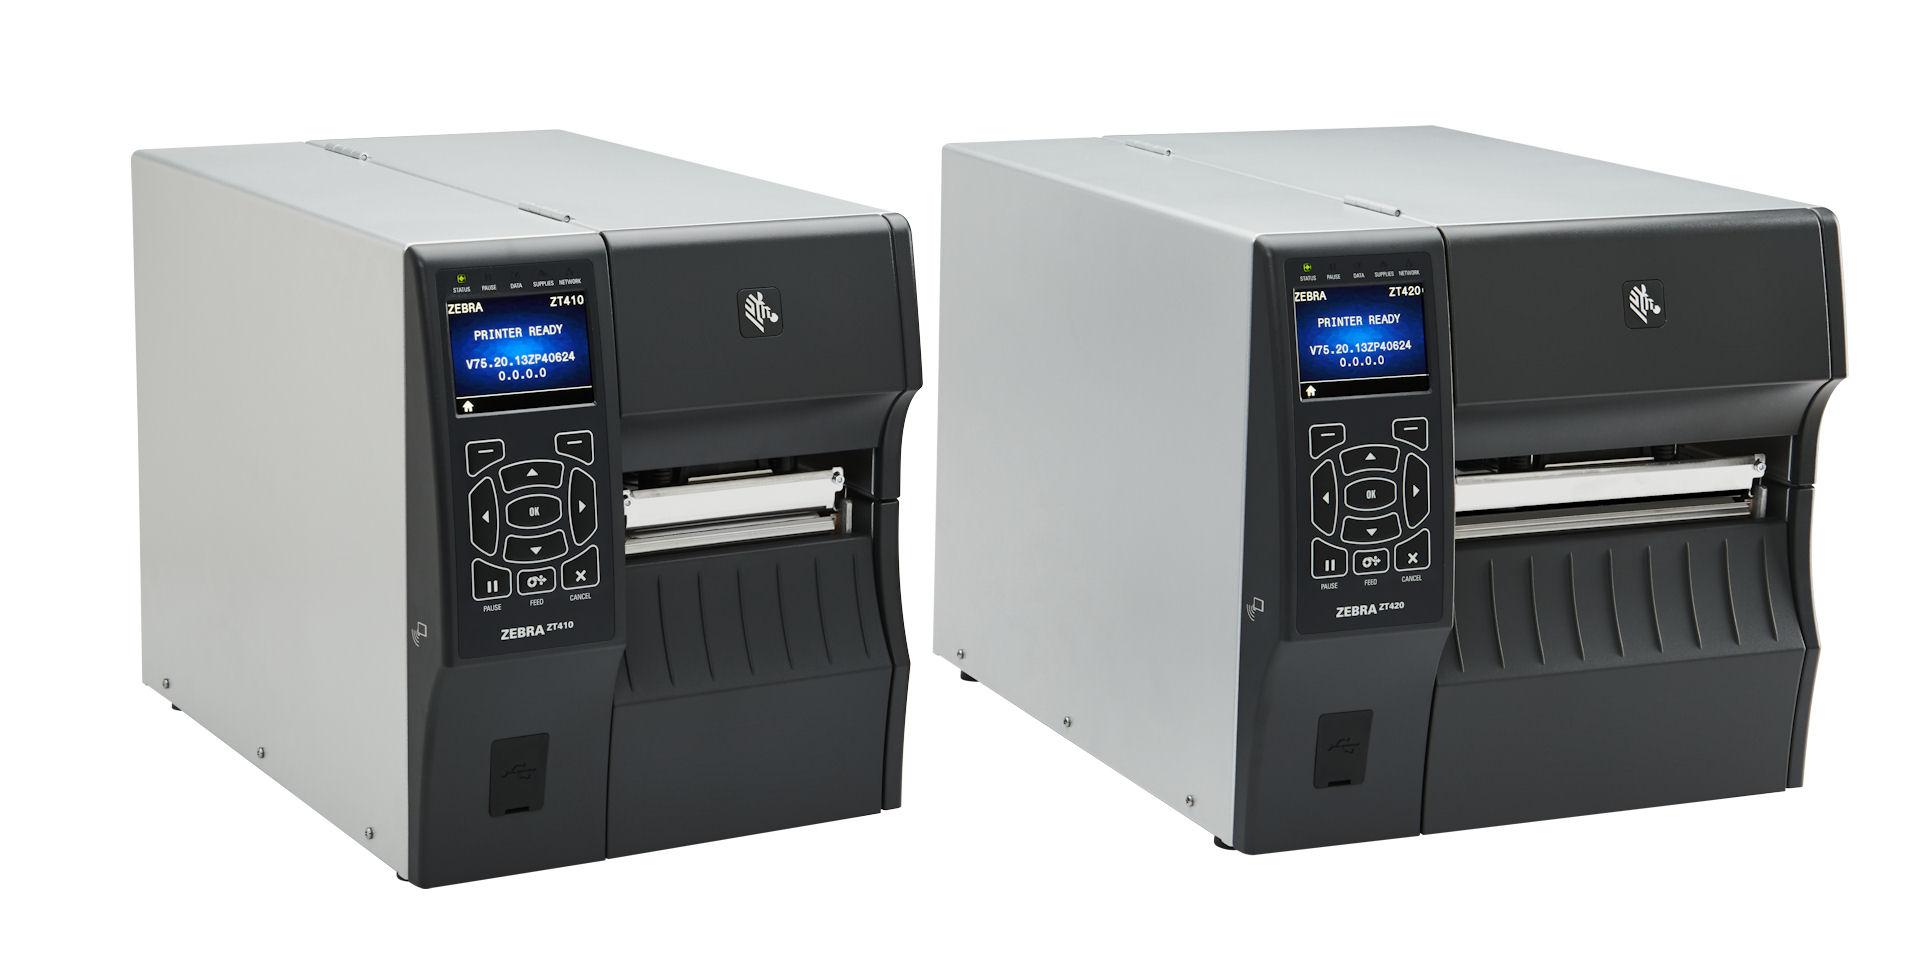 Printer ZEBRA ZT410 Barcode Printer of synko GmbH